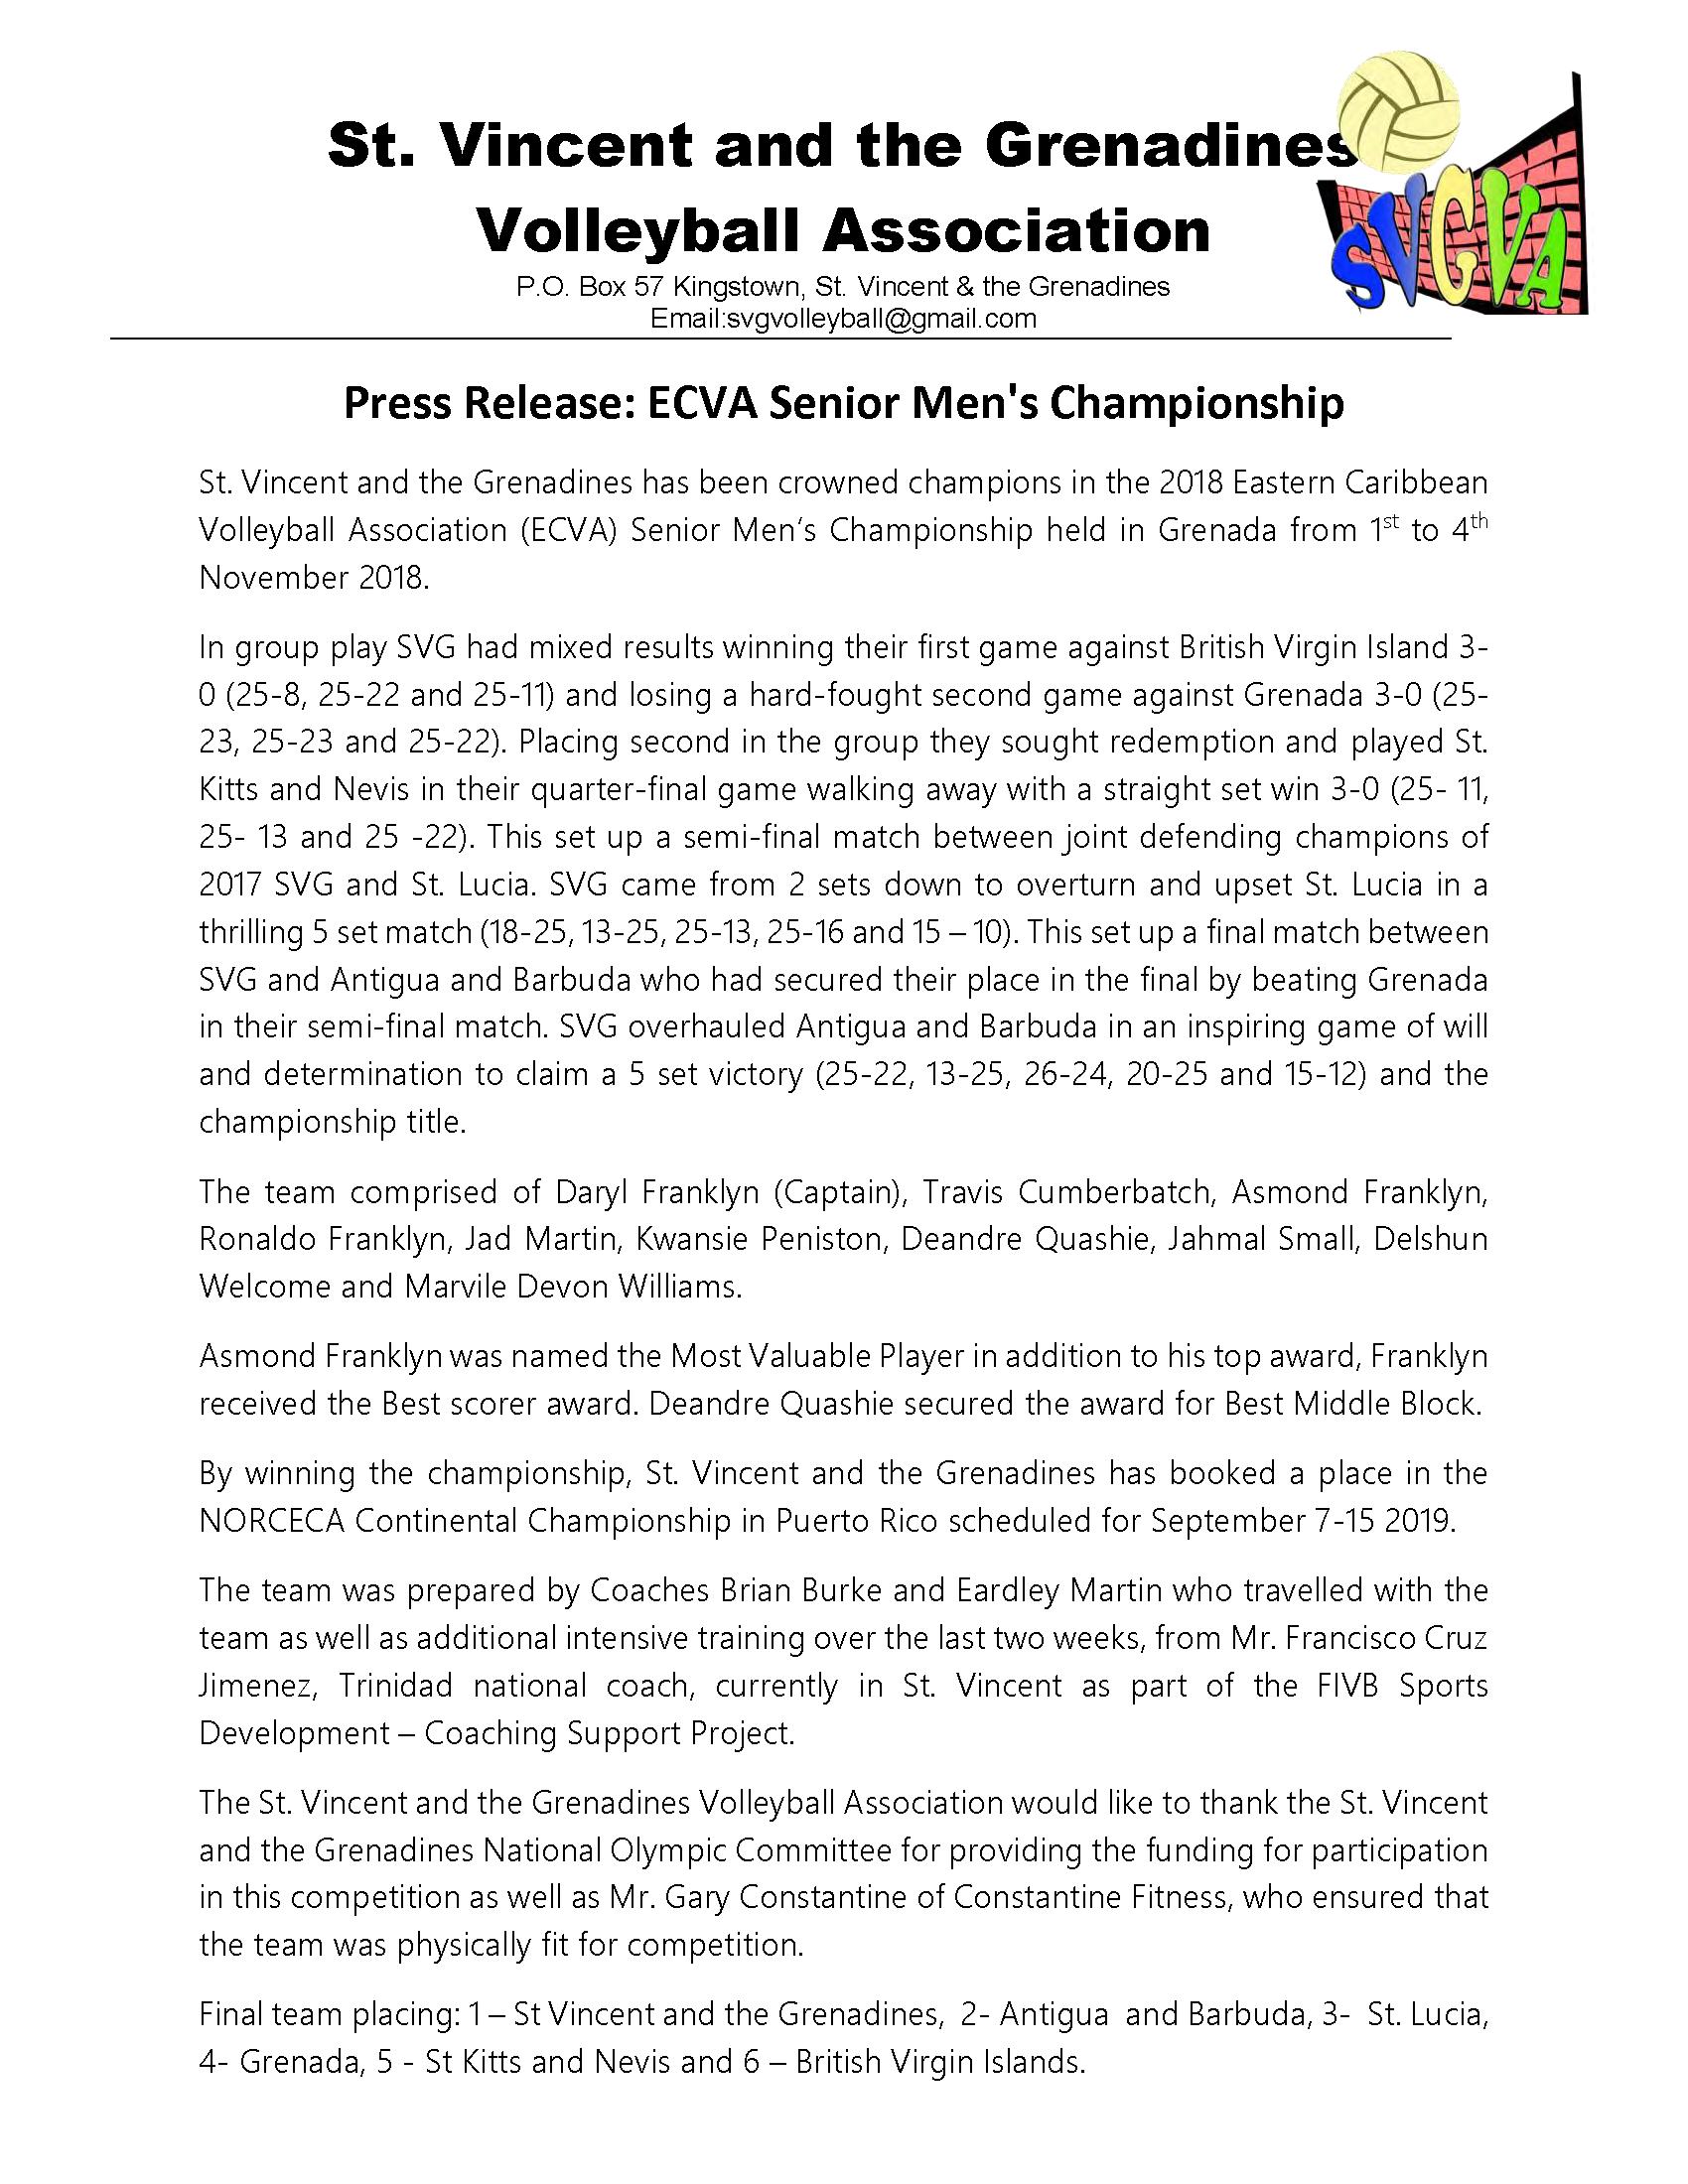 2018 Nov 05 Press Release - ECVA Senior Men's Championship Results_Page_1